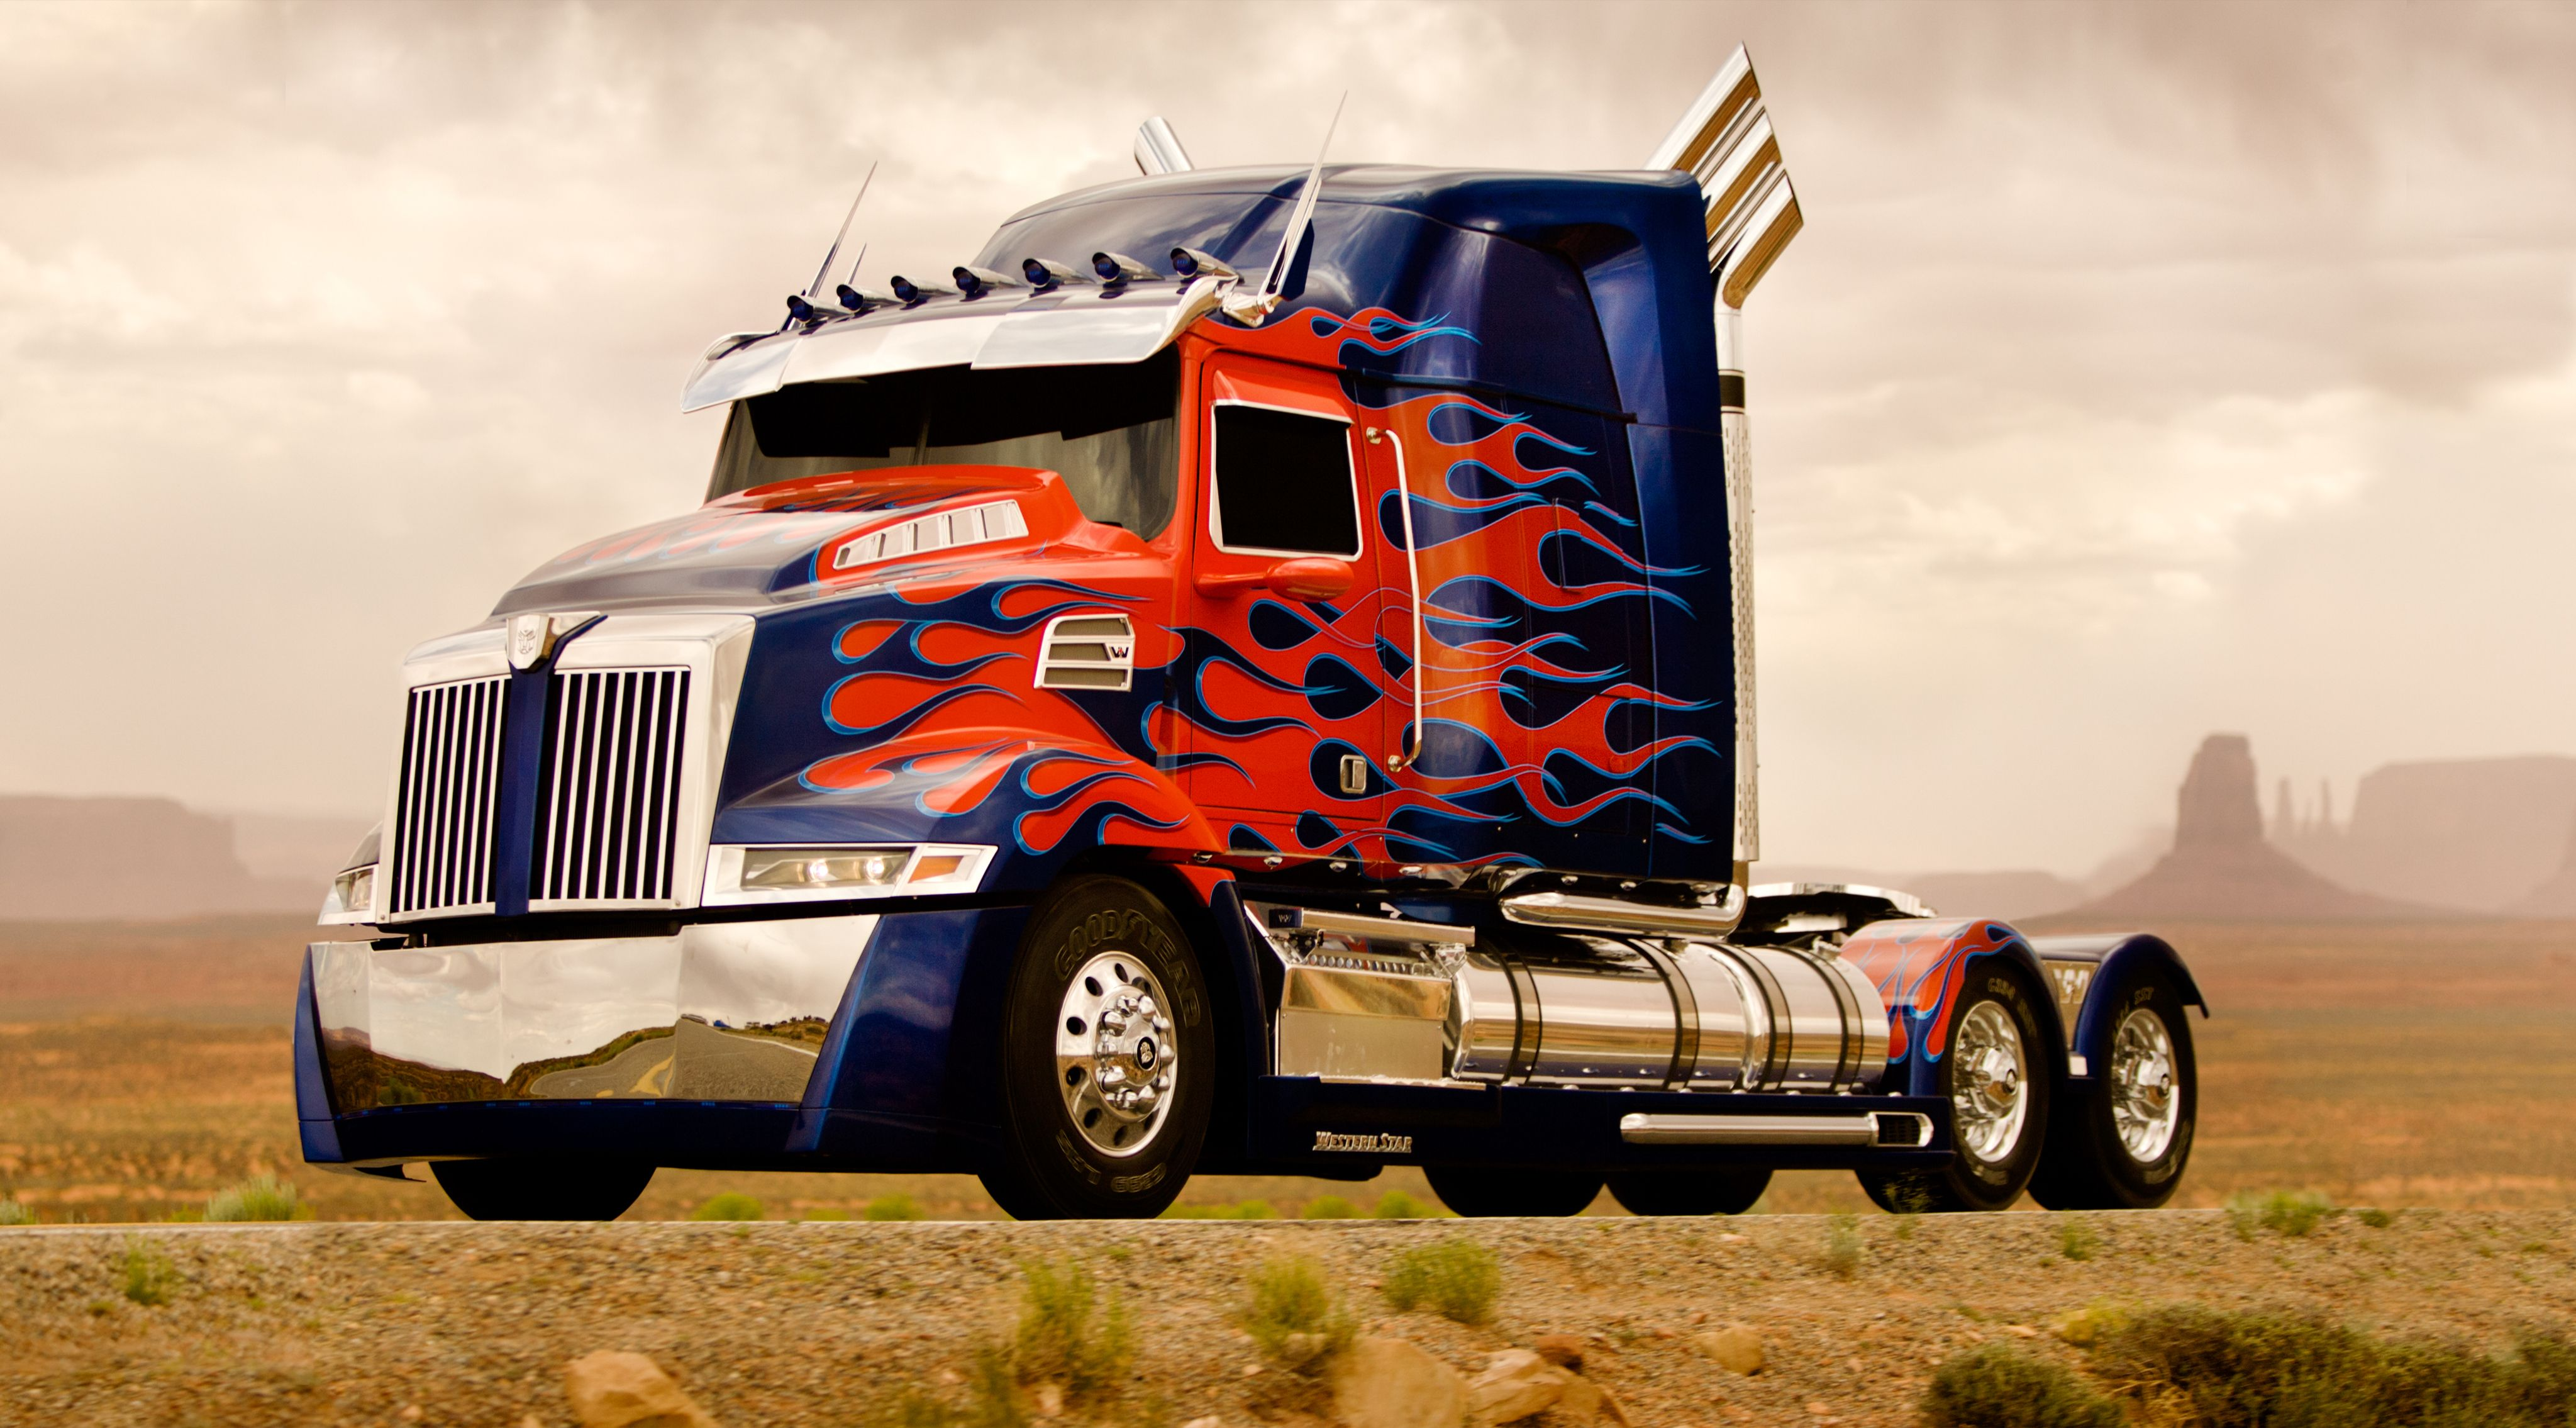 Western star 4900 optimus prime 2014